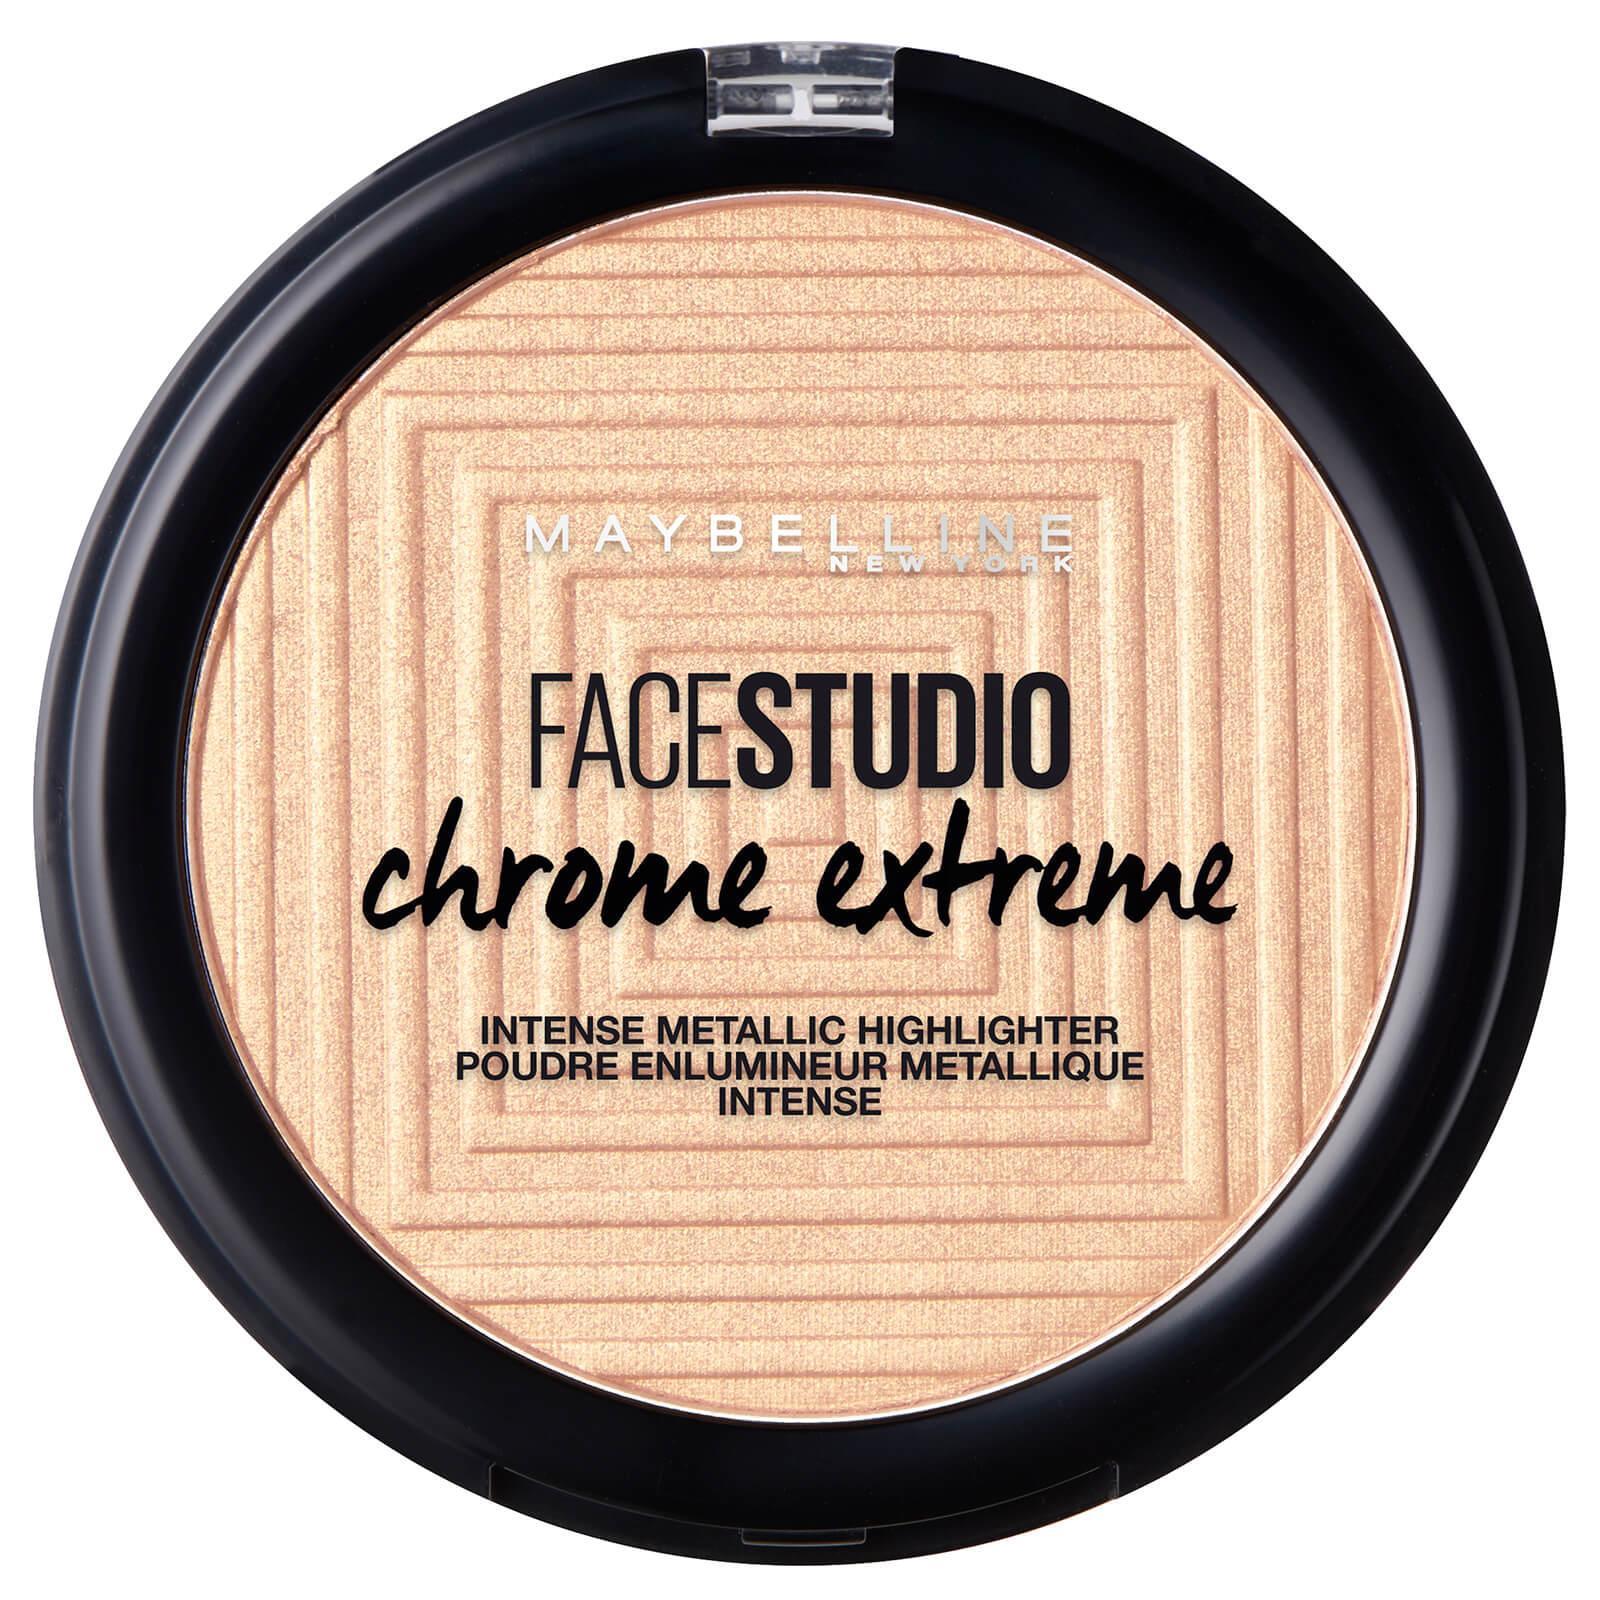 Купить Maybelline Master Chrome Extreme Highlighting Powder 8g (Various Shades) - 300 Sandstone